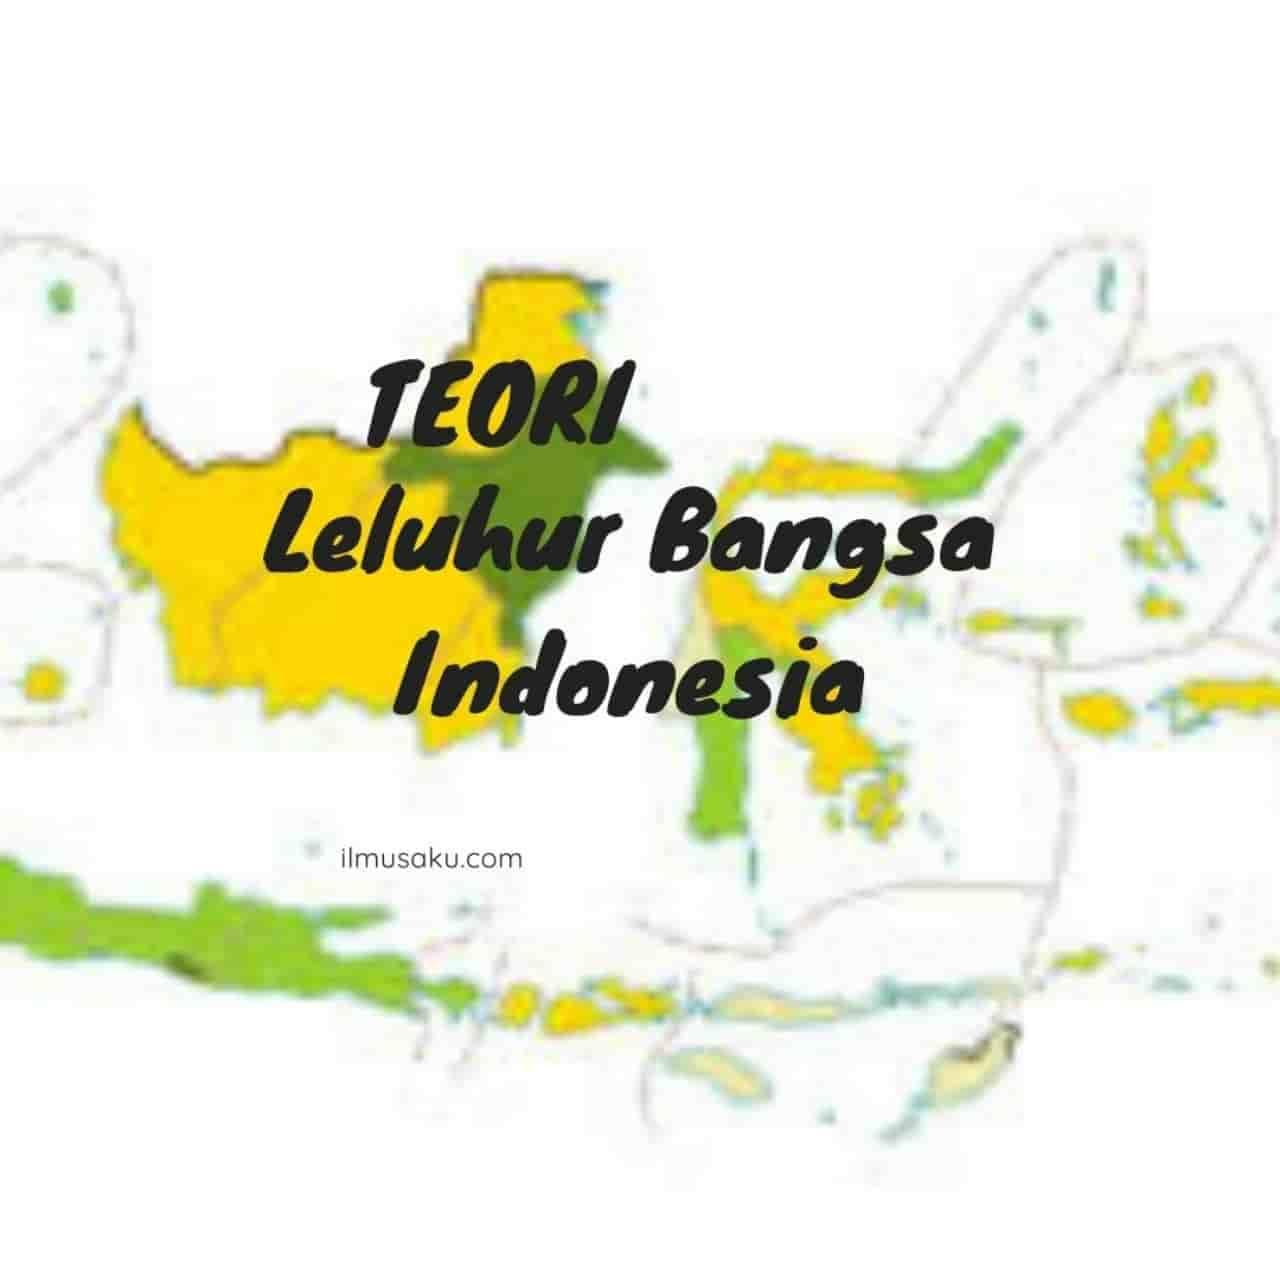 asal usul moyang Indonesia copy 1280x1280 min